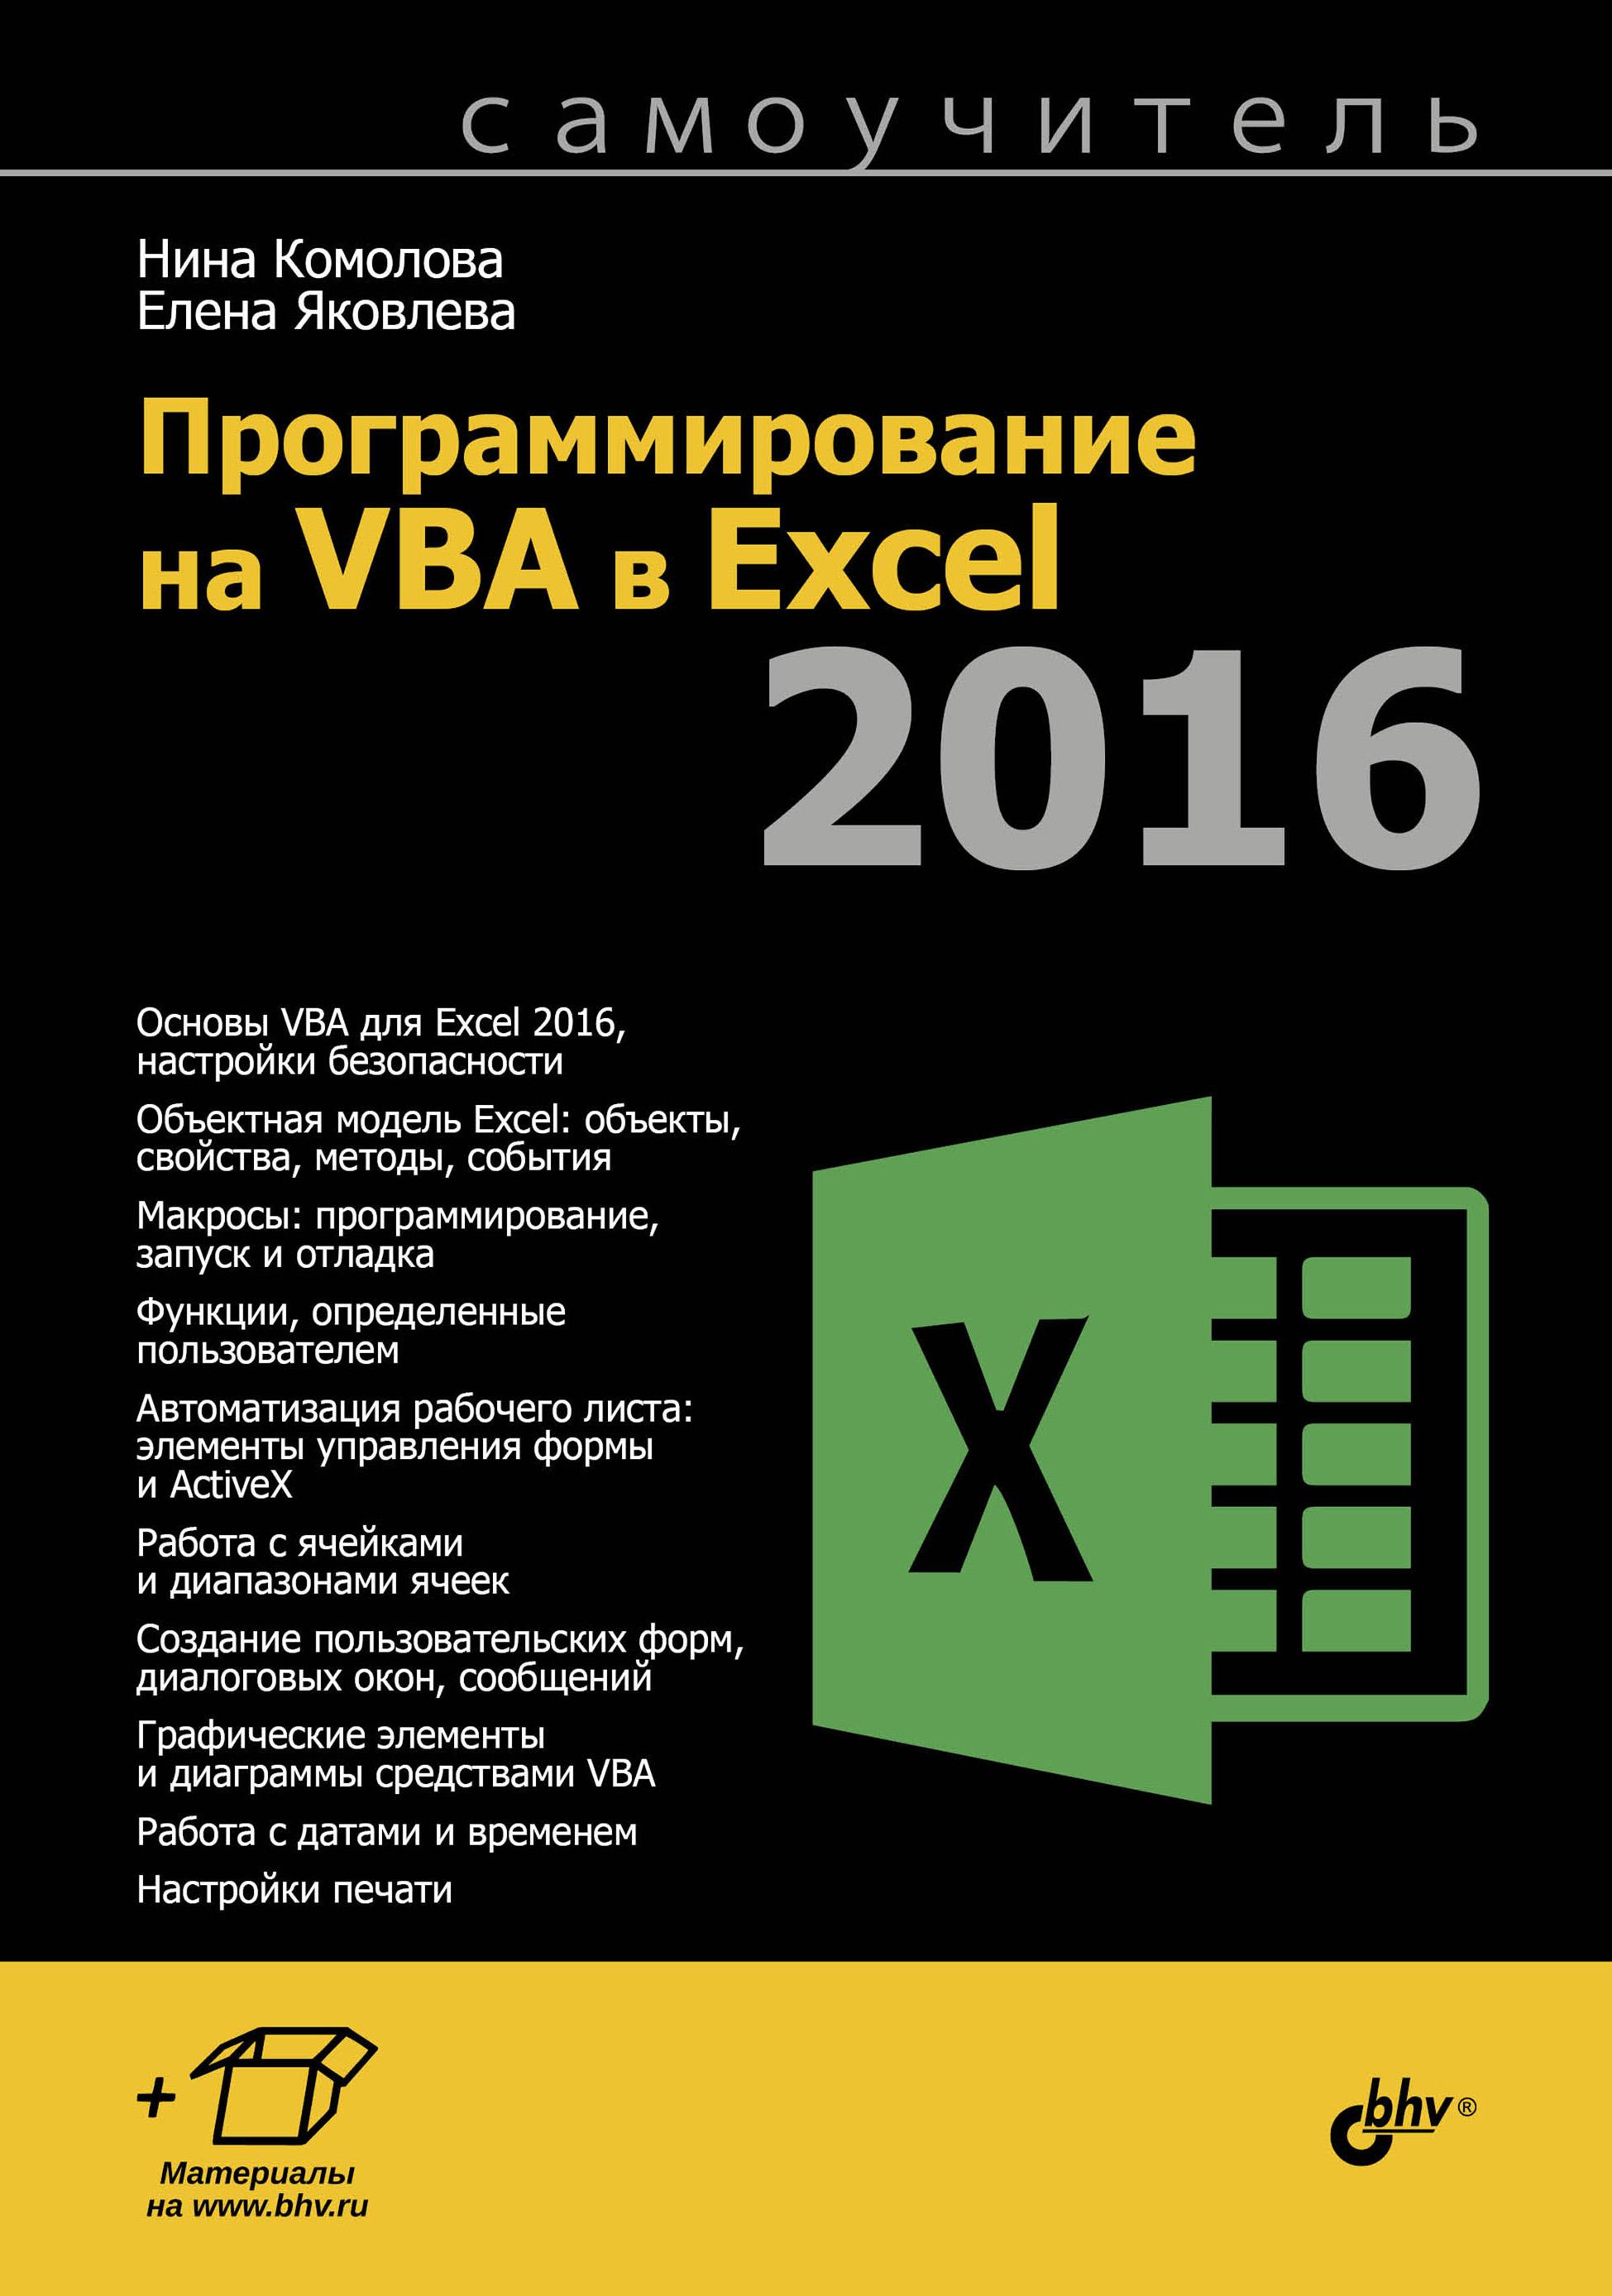 Нина Комолова Программирование на VBA в Excel 2016. Самоучитель программирование на vba в excel 2016 самоучитель